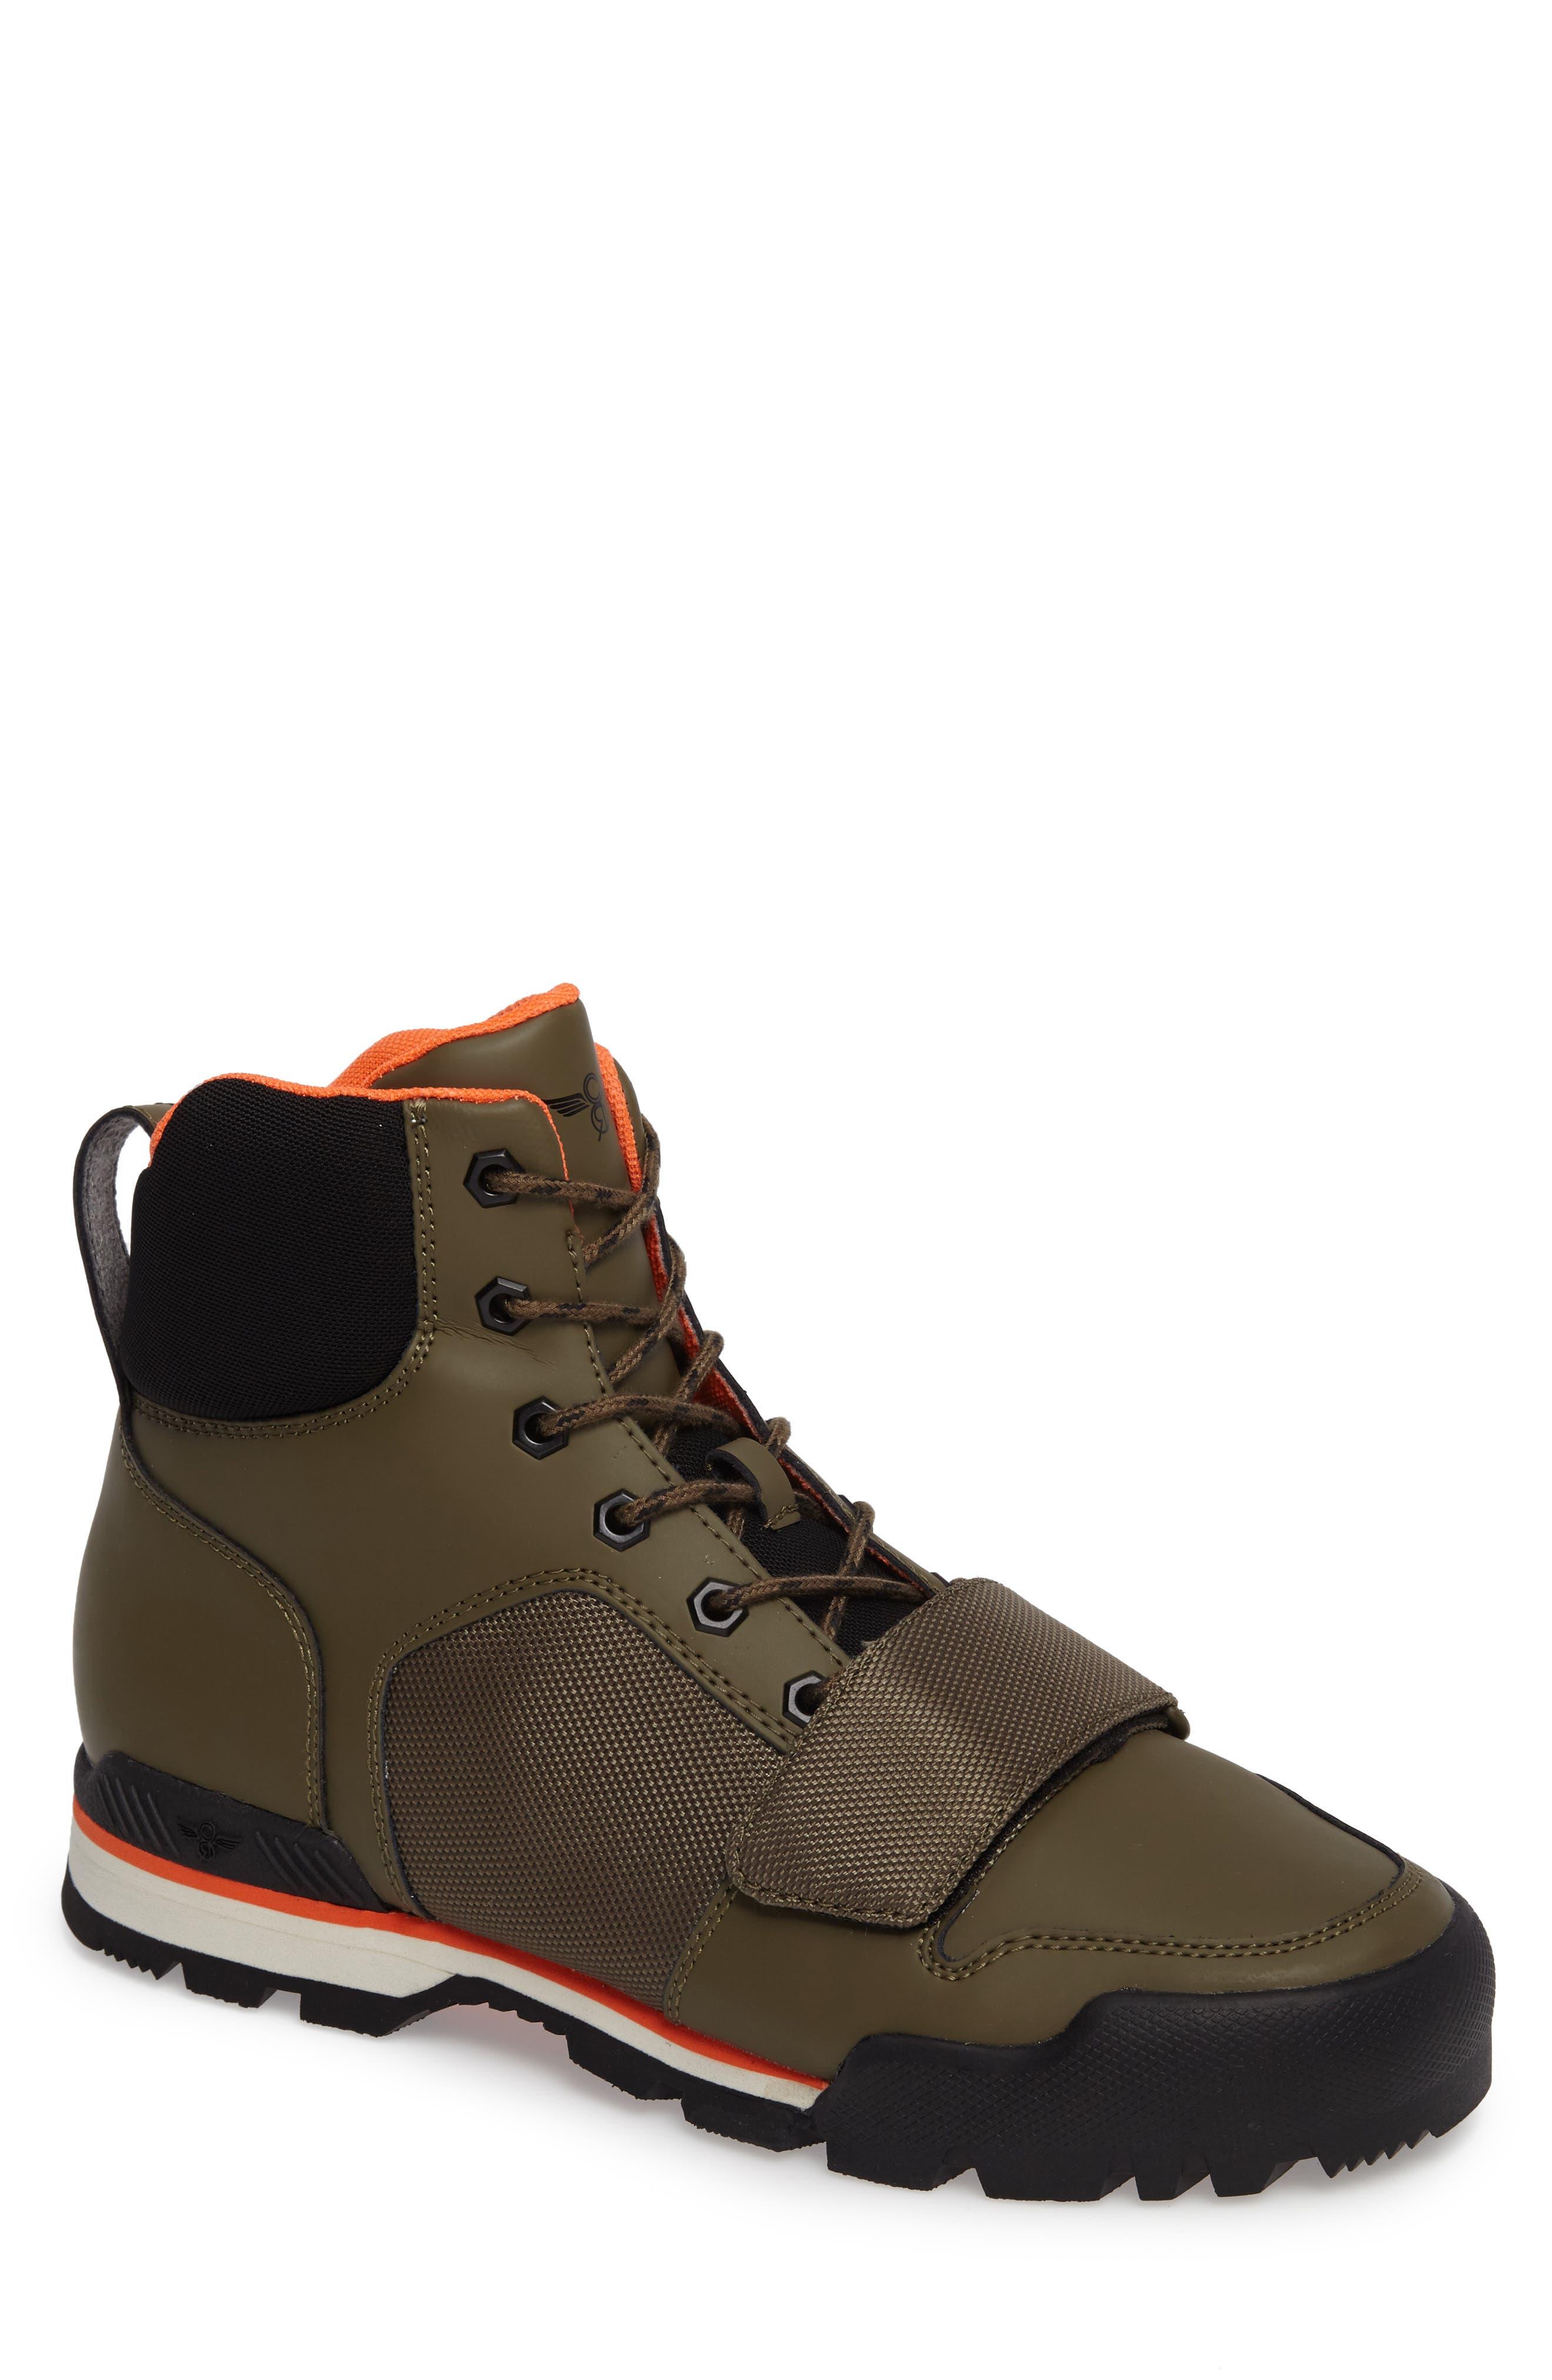 Main Image - Creative Recreation Scotto Sneaker (Men)